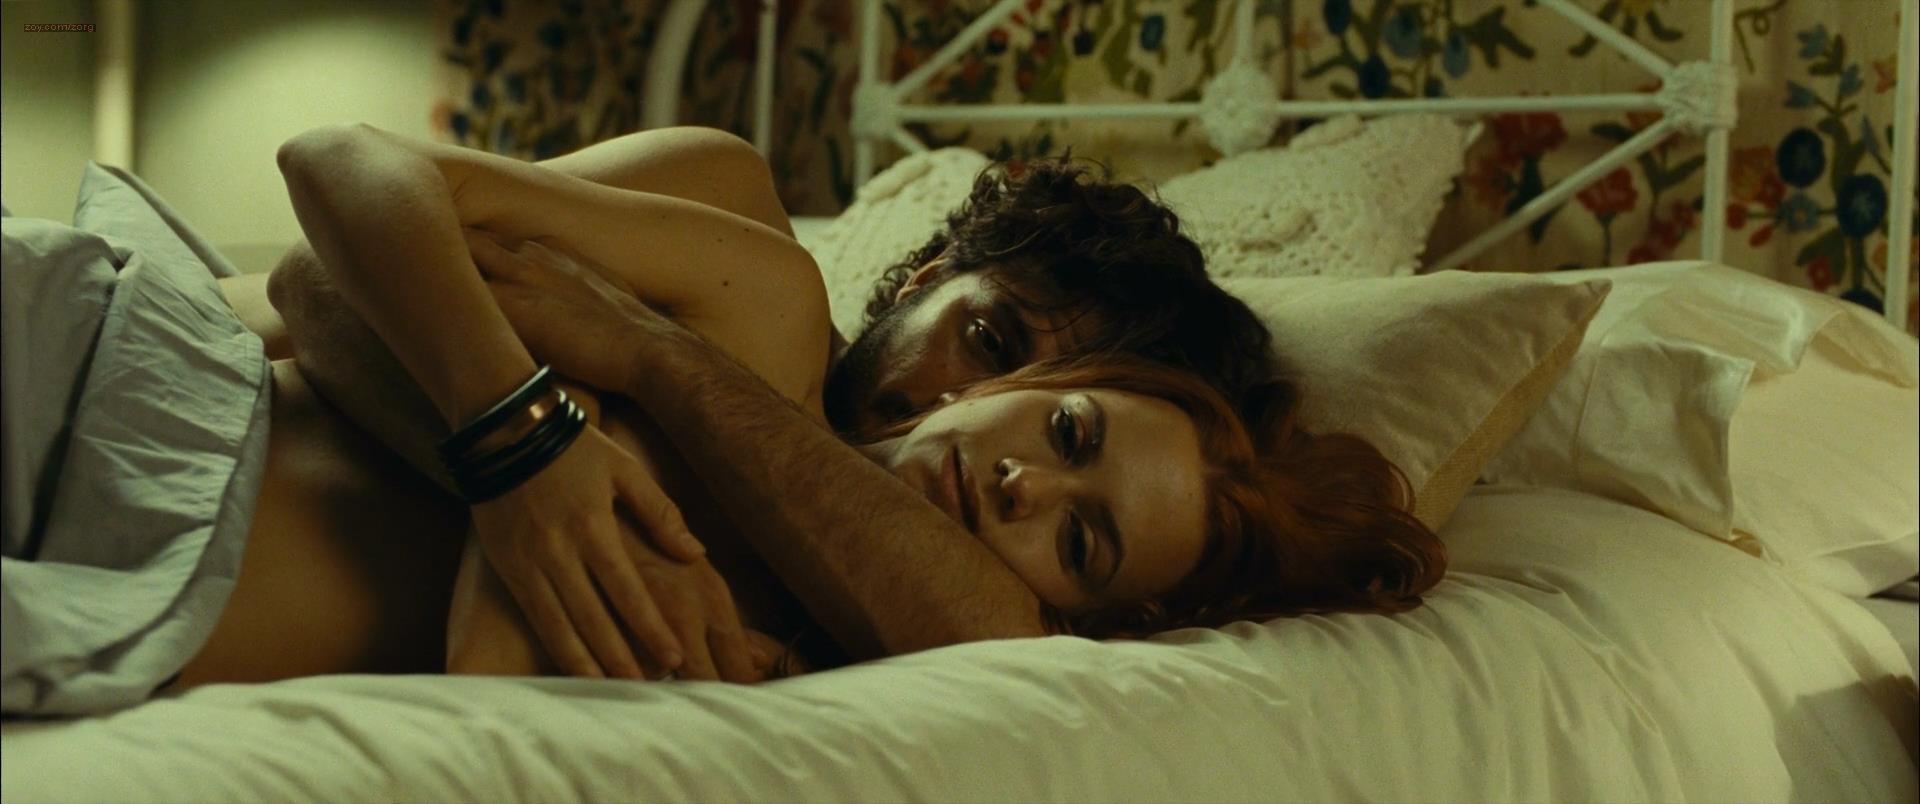 Aura Garrido Nude aura garrido nude topless sex and oral - the body (es-2012